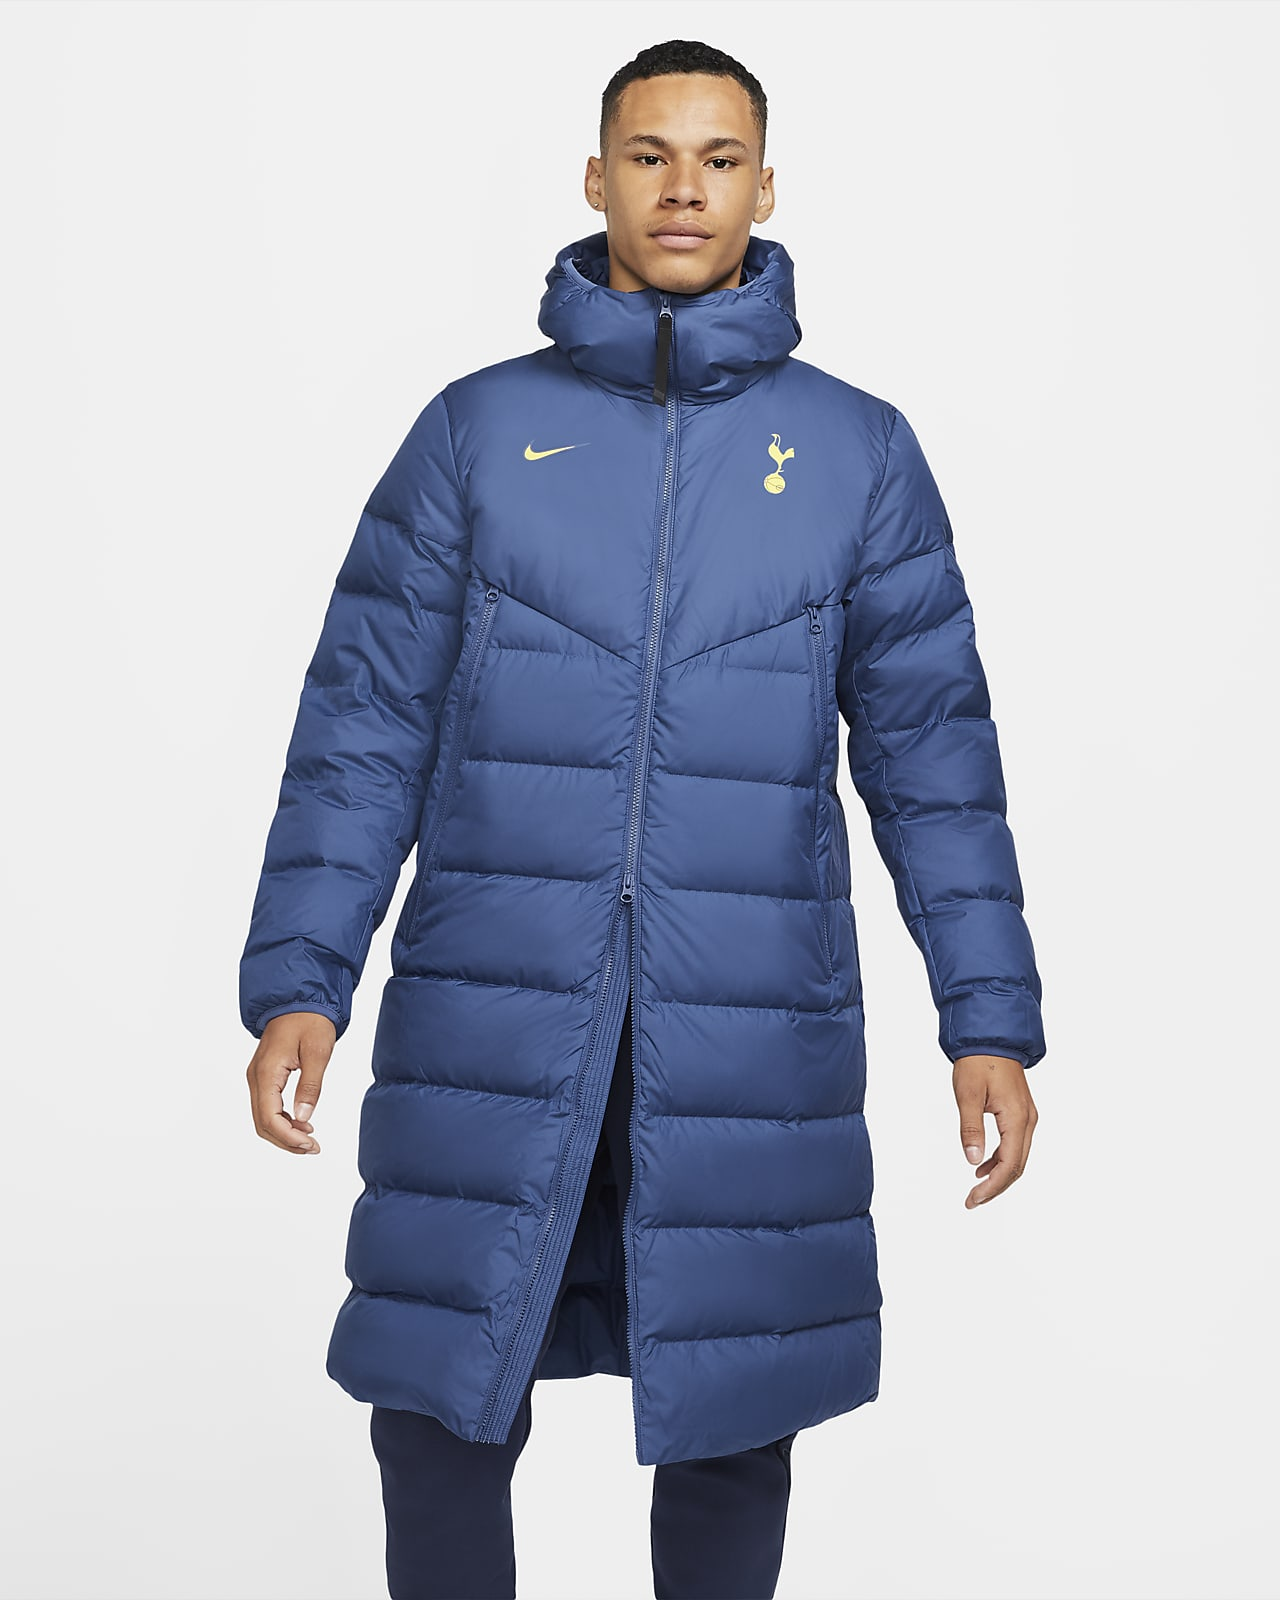 Mariscos hotel Alcalde  Tottenham Hotspur Strike Chaqueta de plumón de fútbol - Hombre. Nike ES